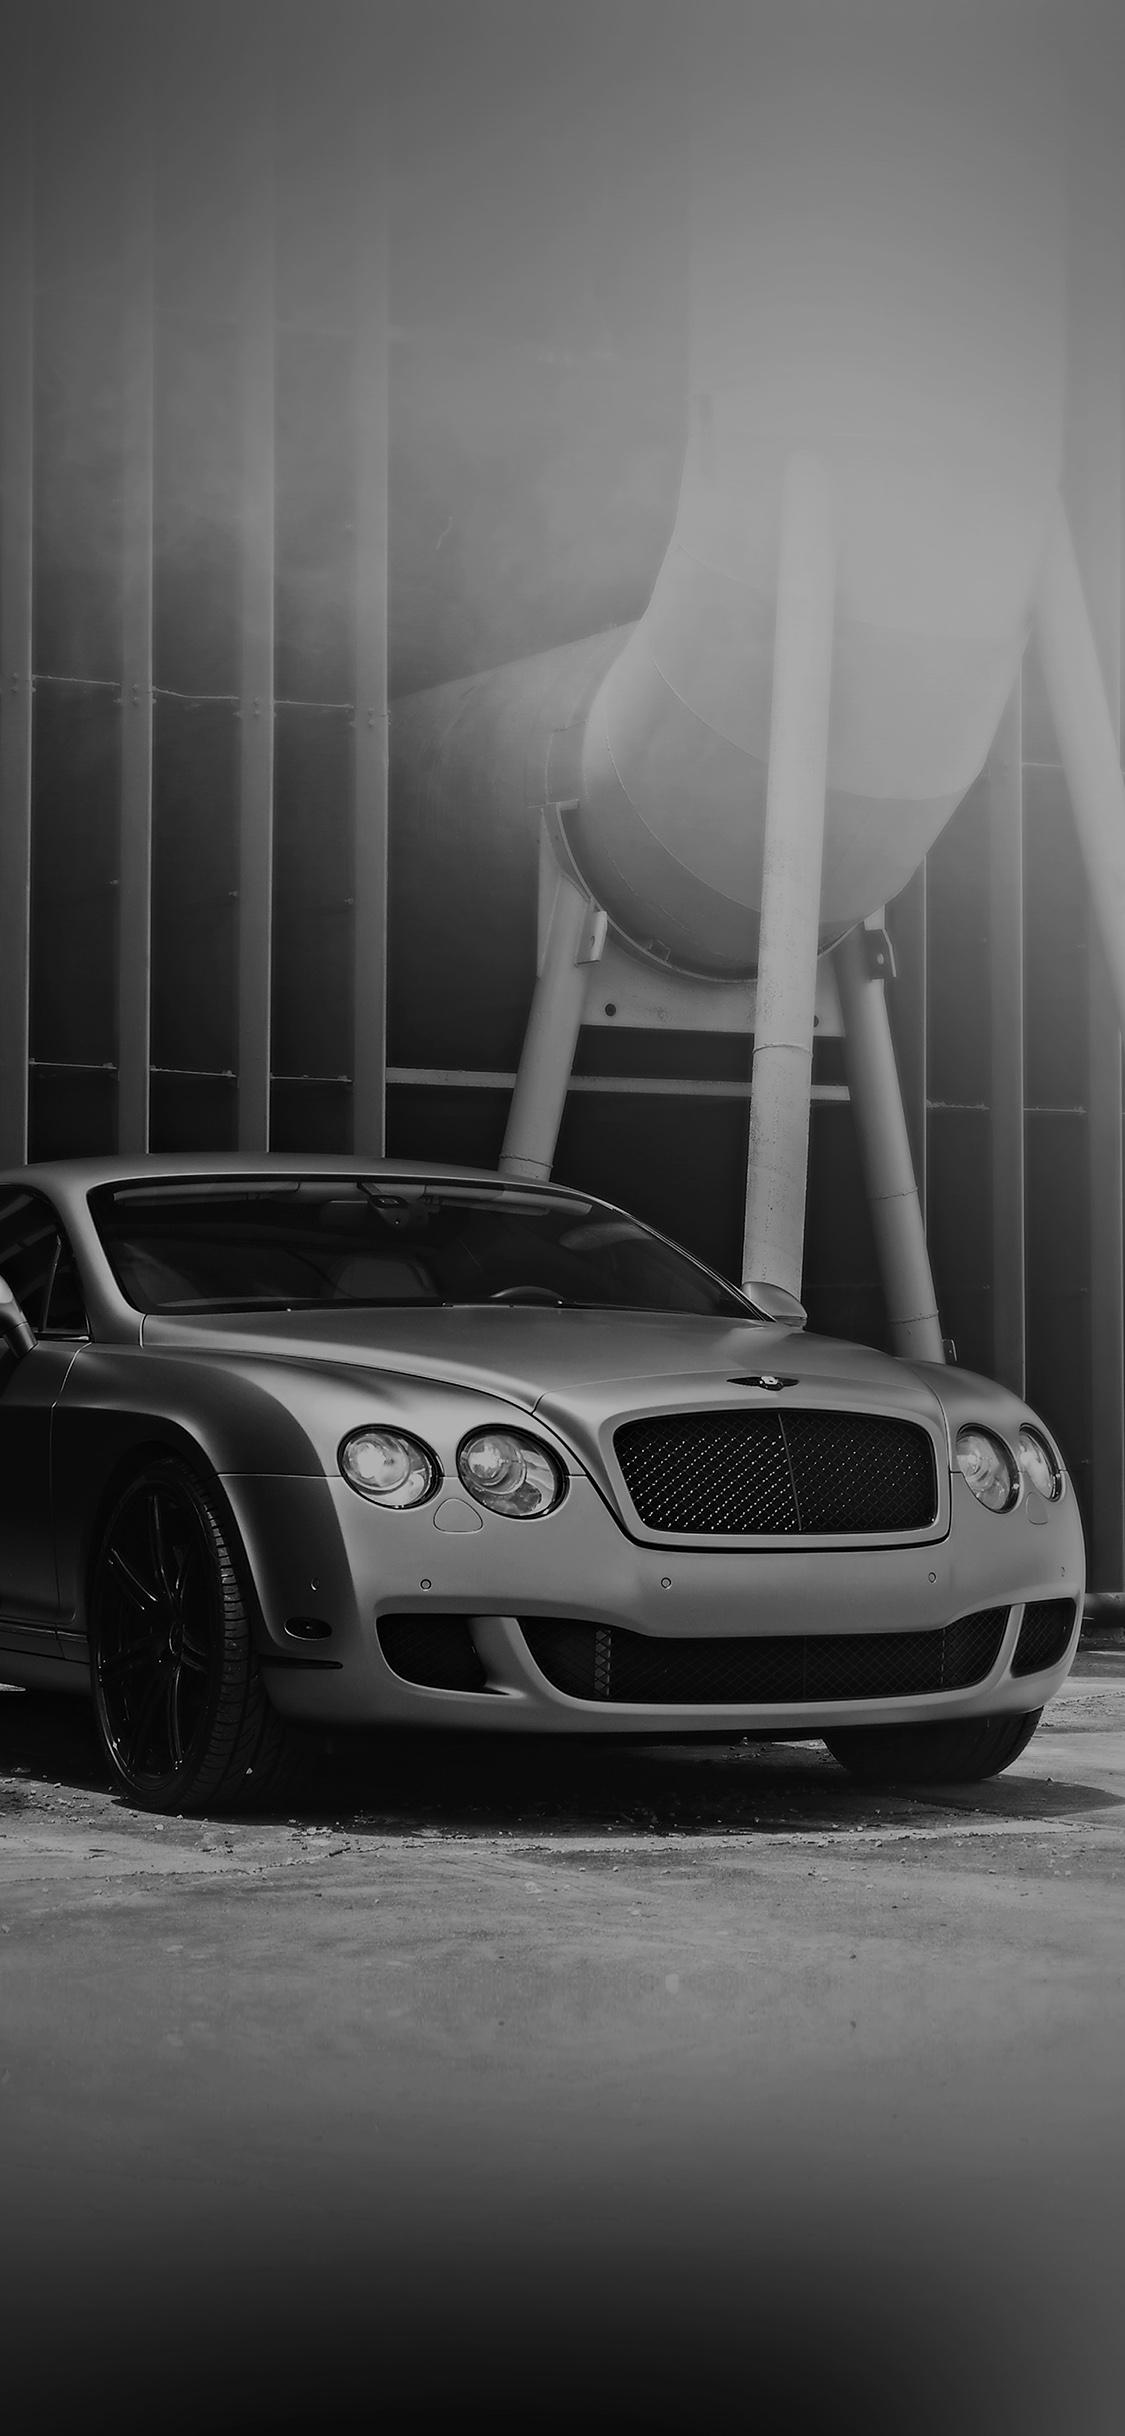 Bentley Motors Bw Dark Car Park Art City Iphone X Wallpaper Download